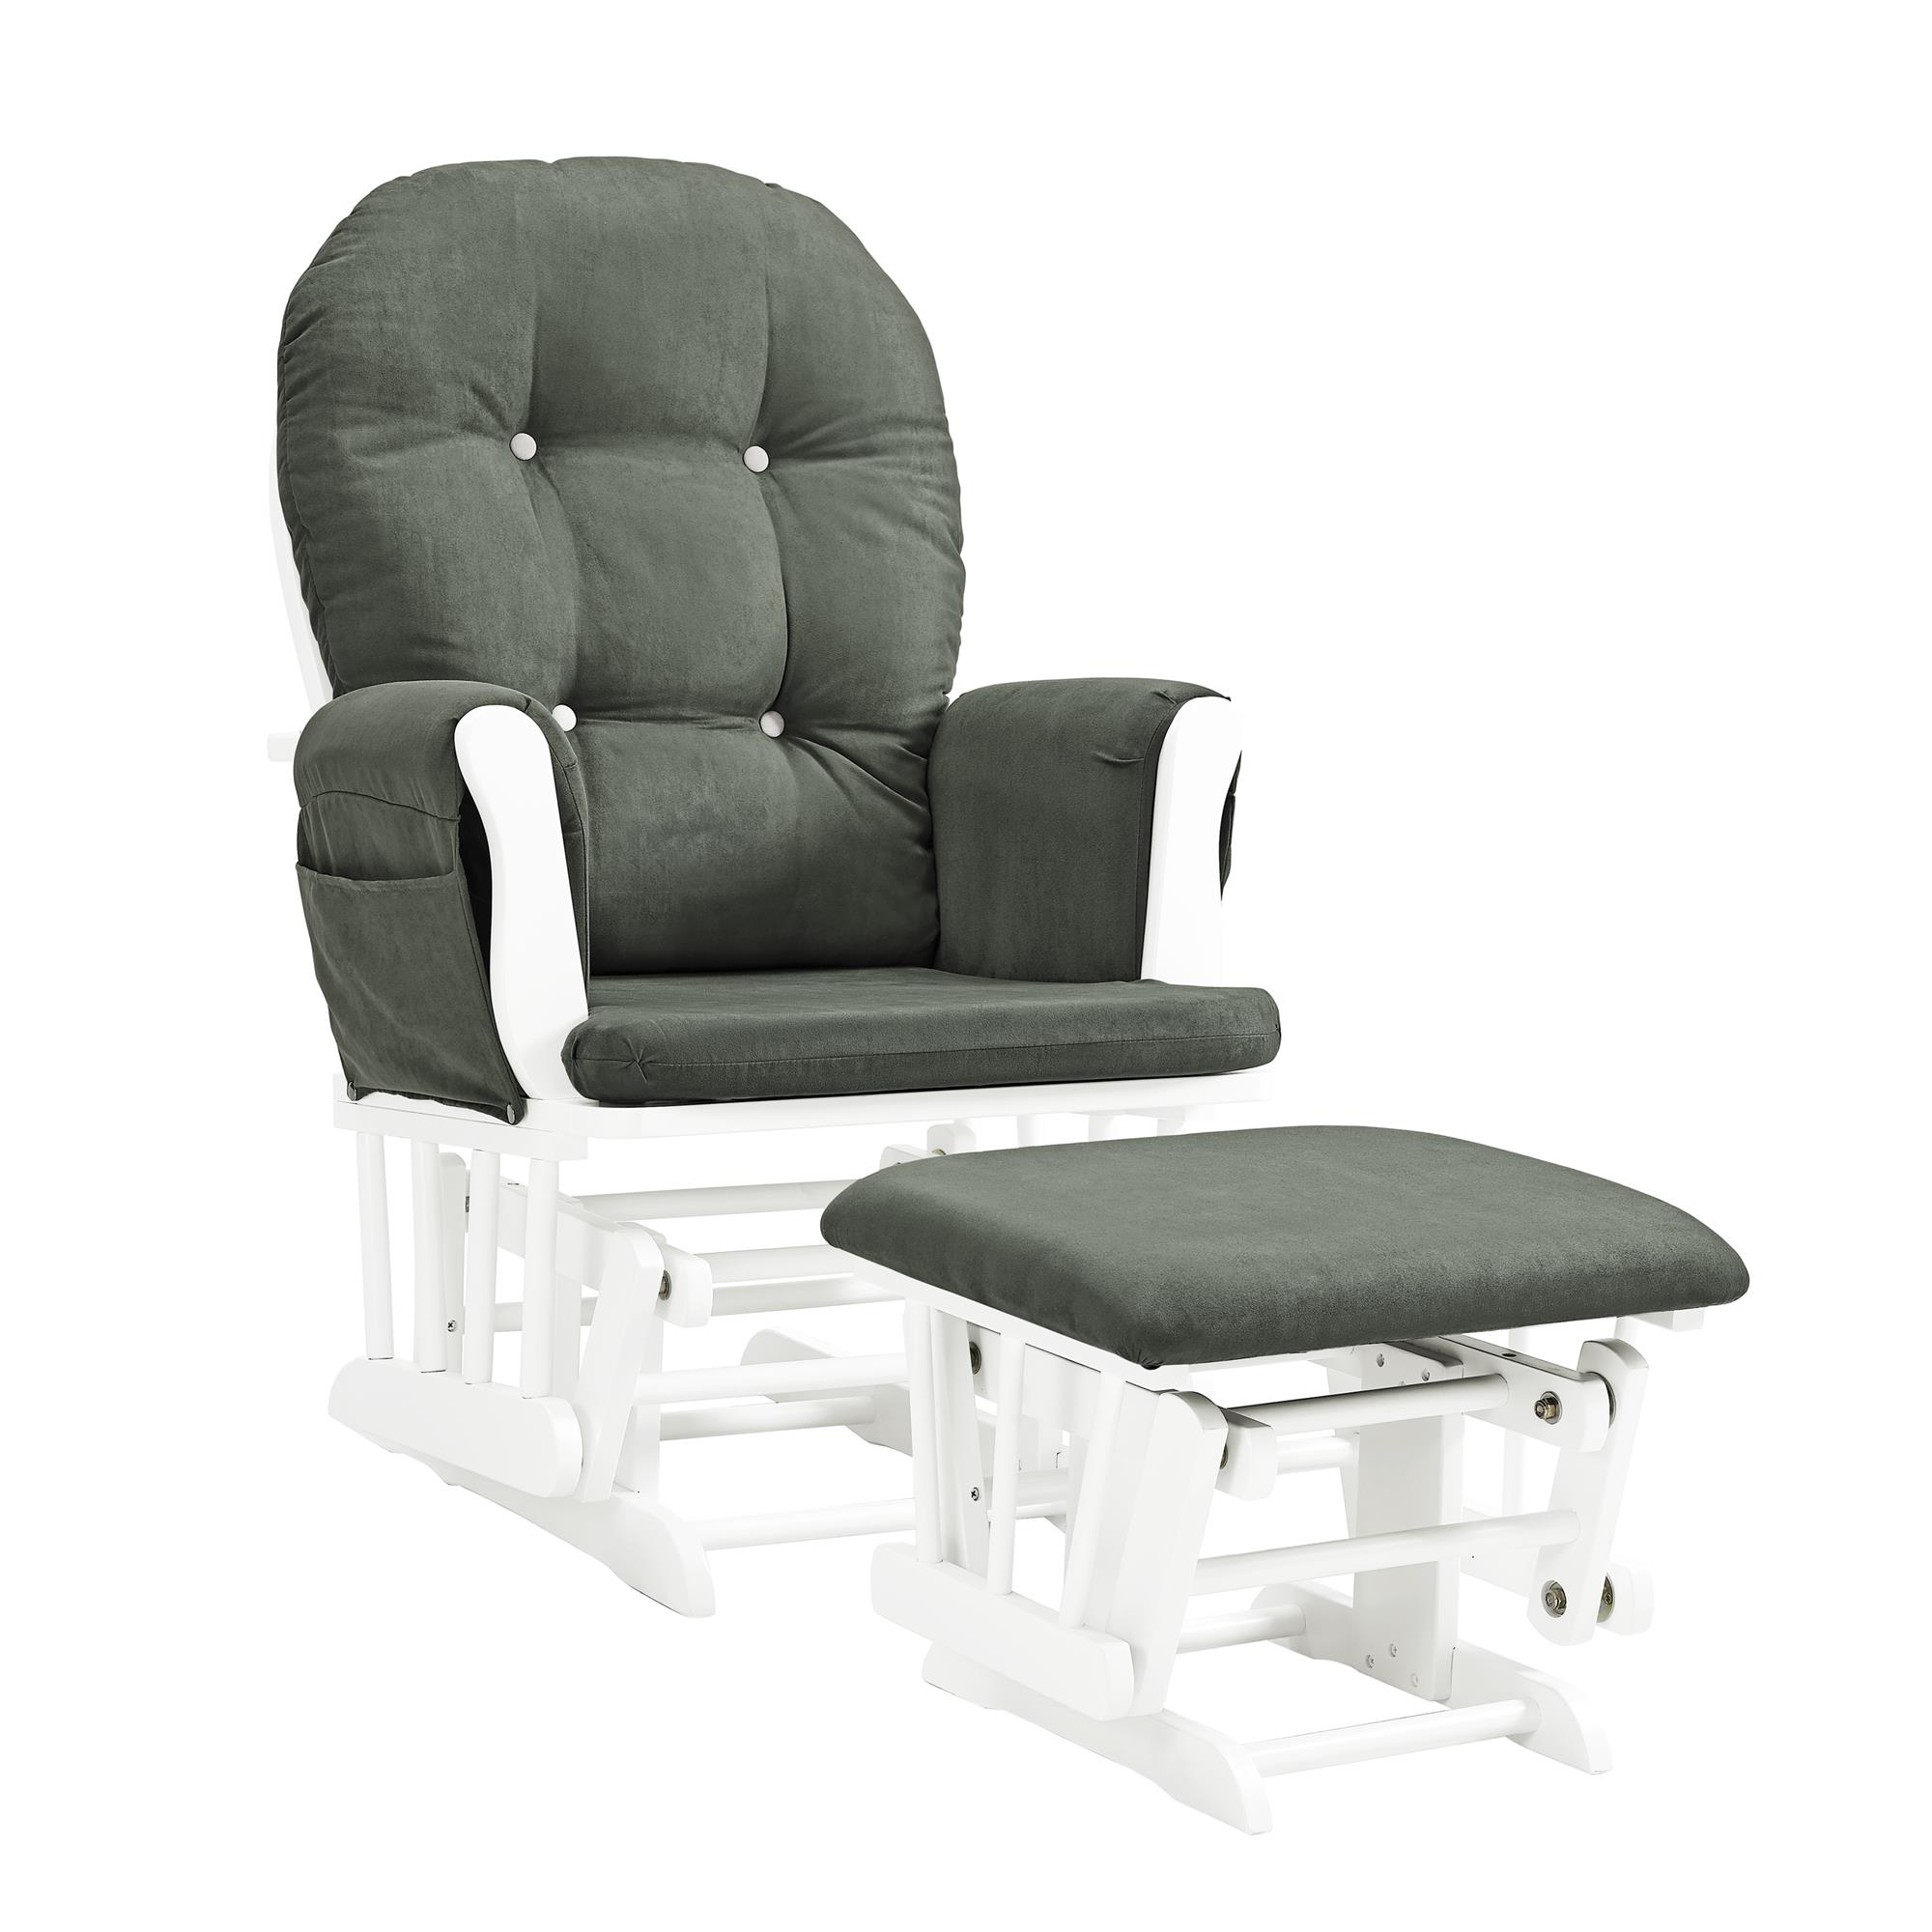 Glider Chair And Ottoman Nursery Rocking Furniture Baby Rocker Seat White//Grey